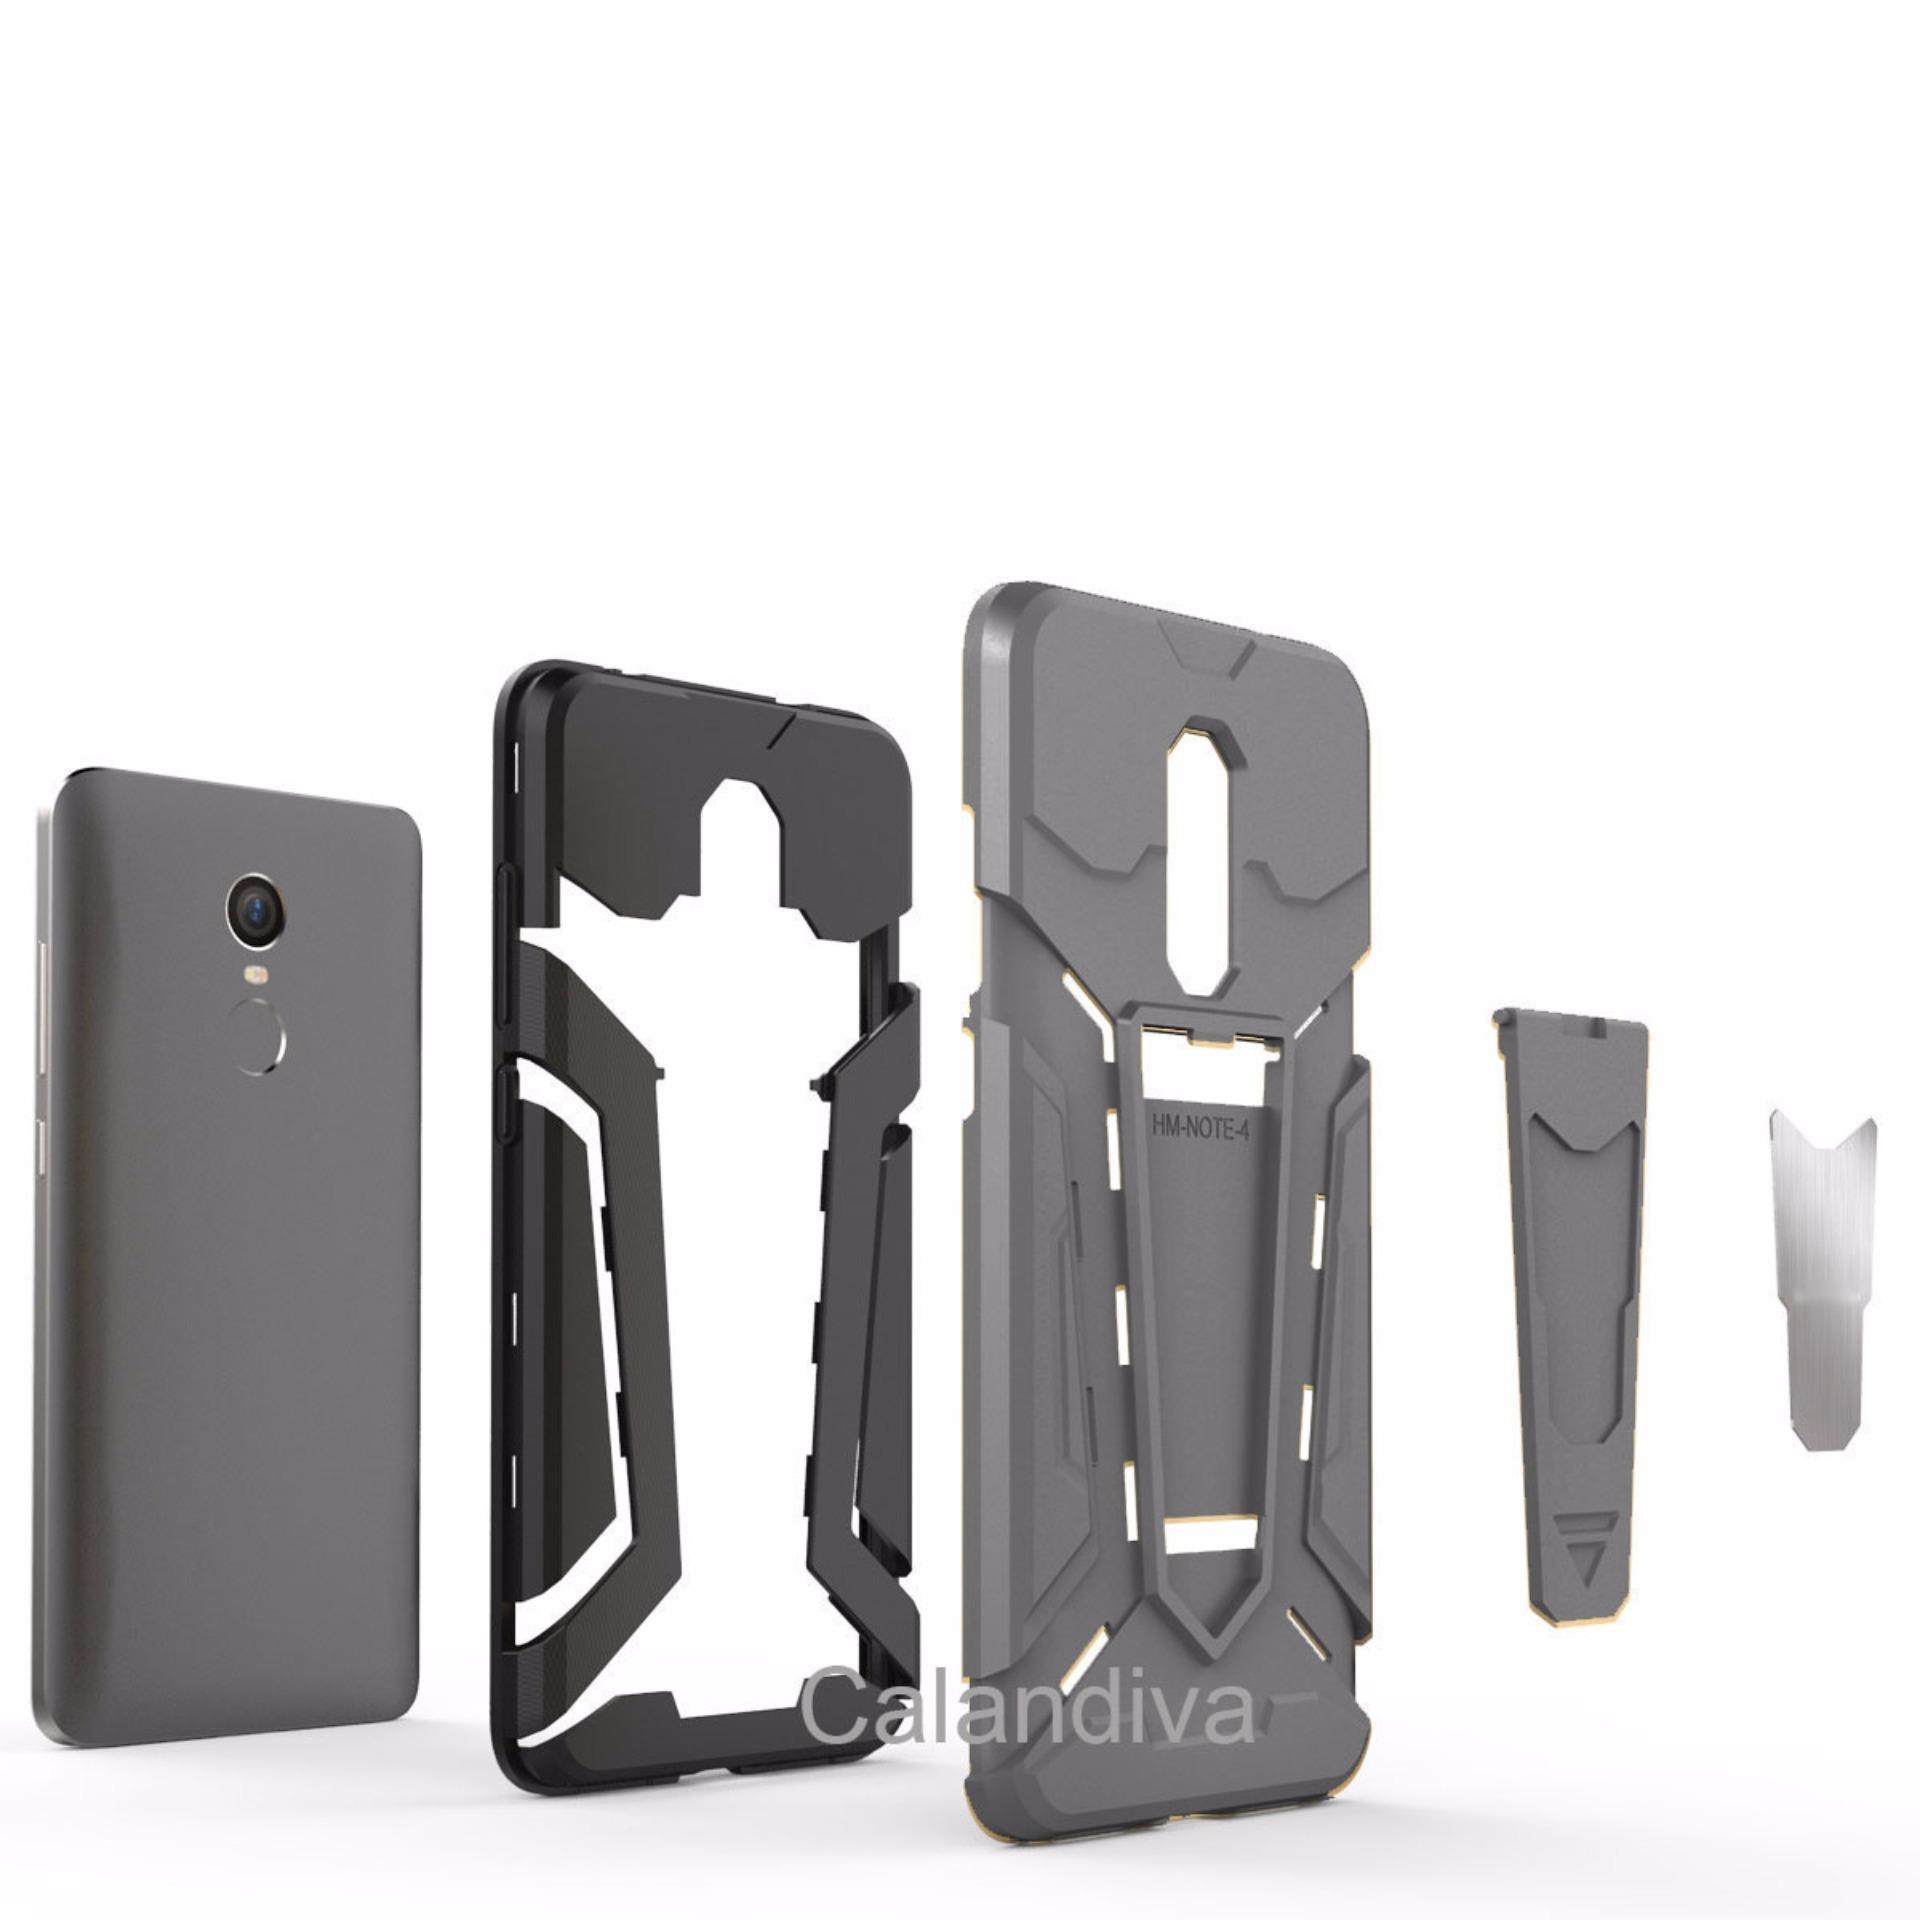 Calandiva Dragon Shockproof Hybrid Case For Xiaomi Redmi Note 4x Luxury Tempered Glass Premium 5 Hitam Transformer Kickstand Slim Armor Hardcase